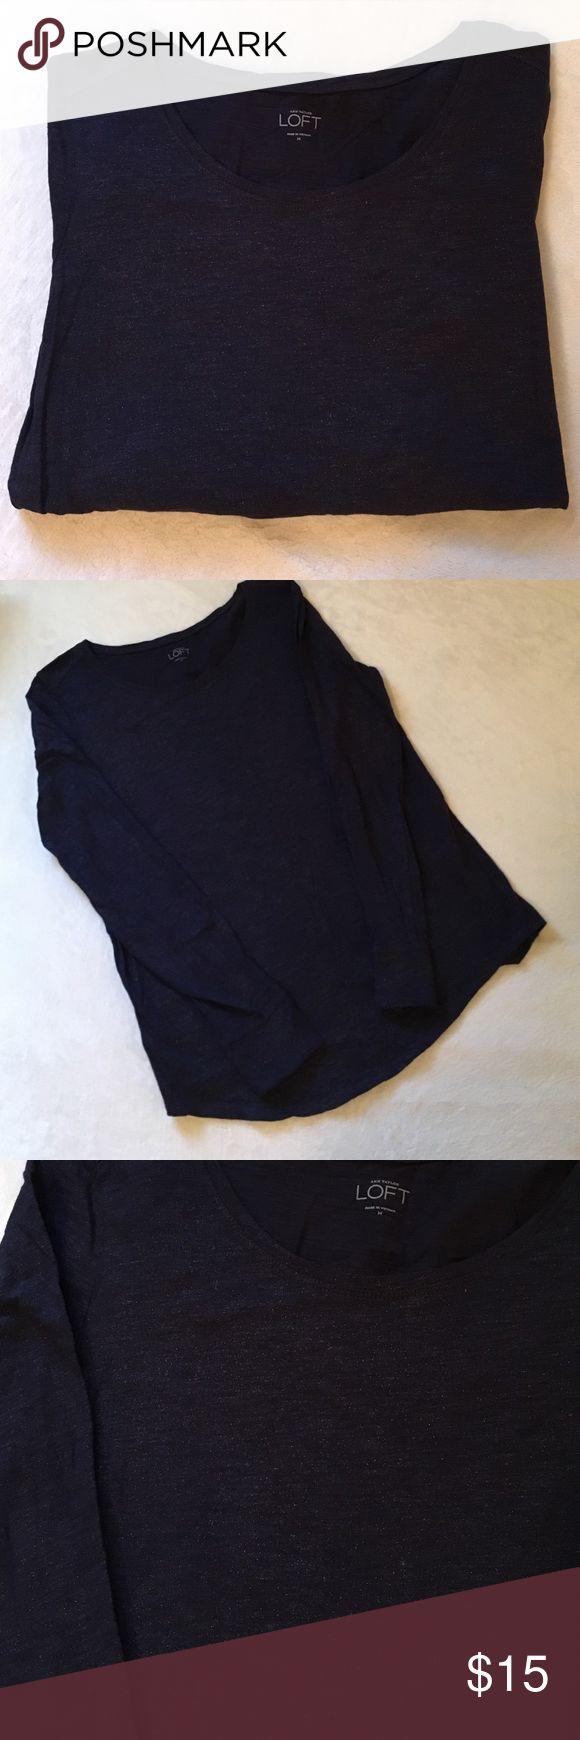 LOFT Metallic Shimmer Top Navy long sleeve top with metallic shimmer throughout. NWOT LOFT Tops Tees - Long Sleeve